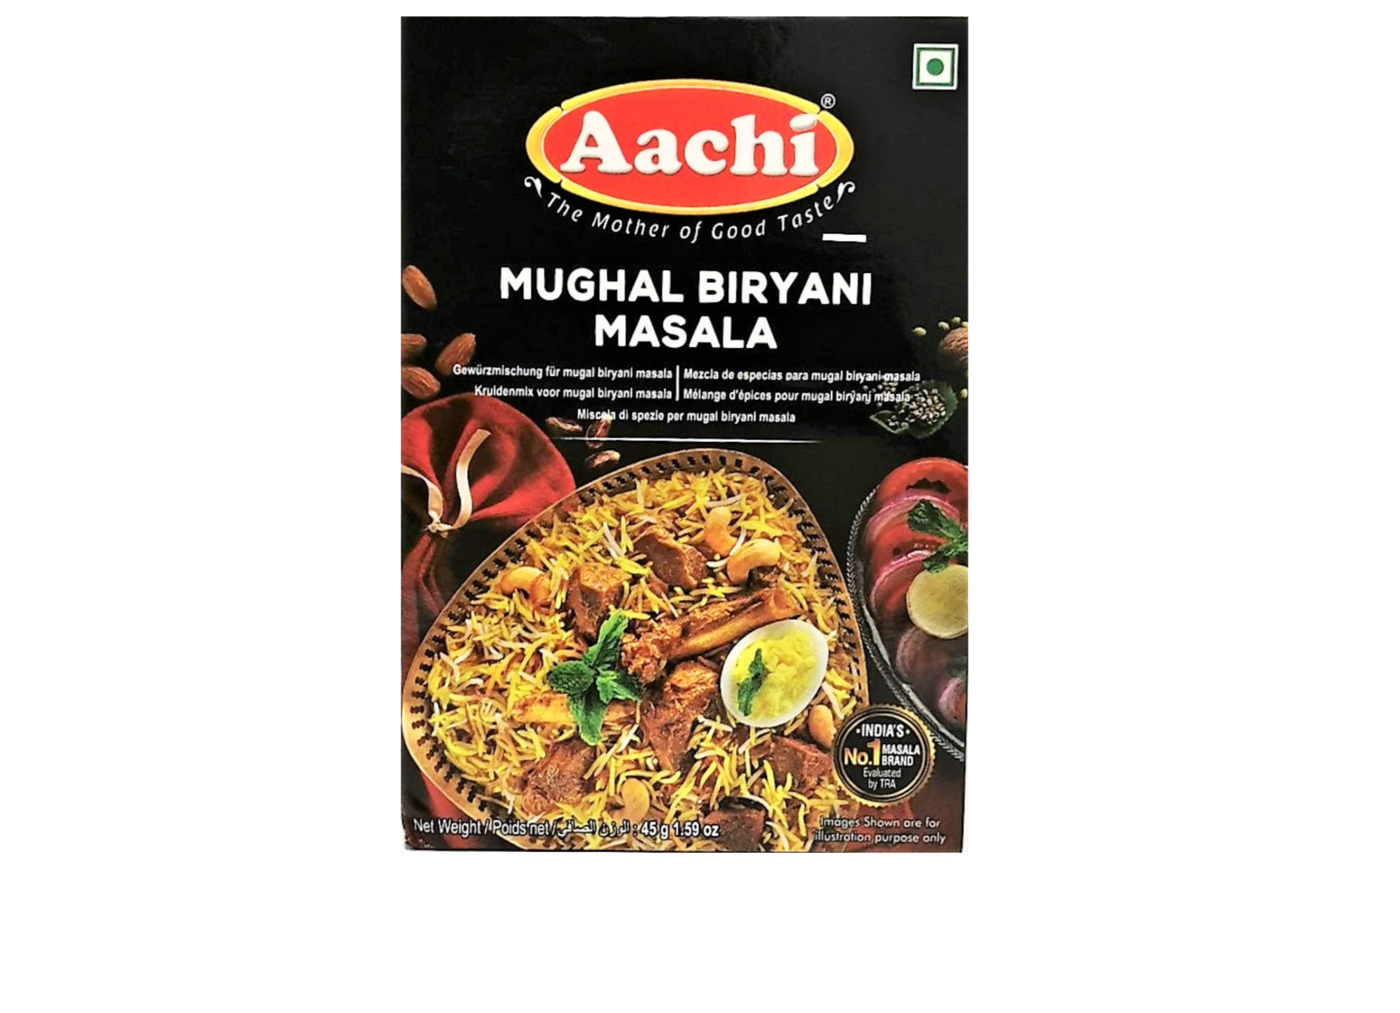 Aachi Mughal Biryani Masala